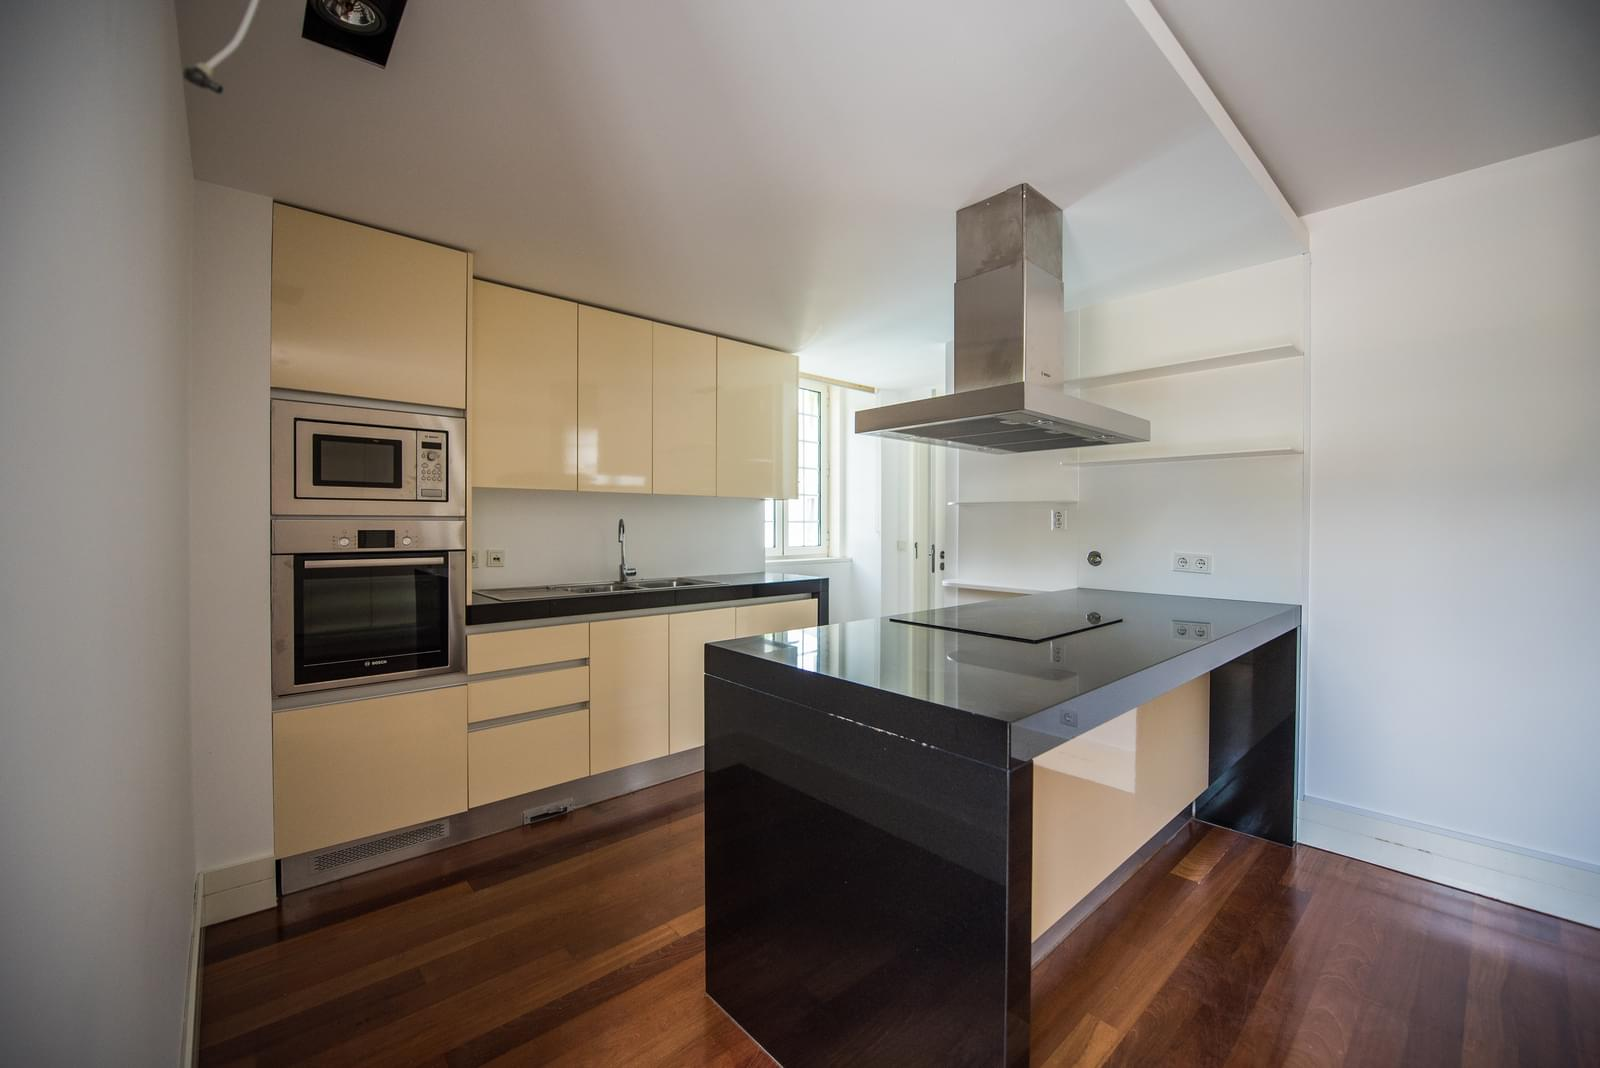 pf19211-apartamento-t4-lisboa-a2c630f9-80f4-4f28-a172-96317e6d18bd